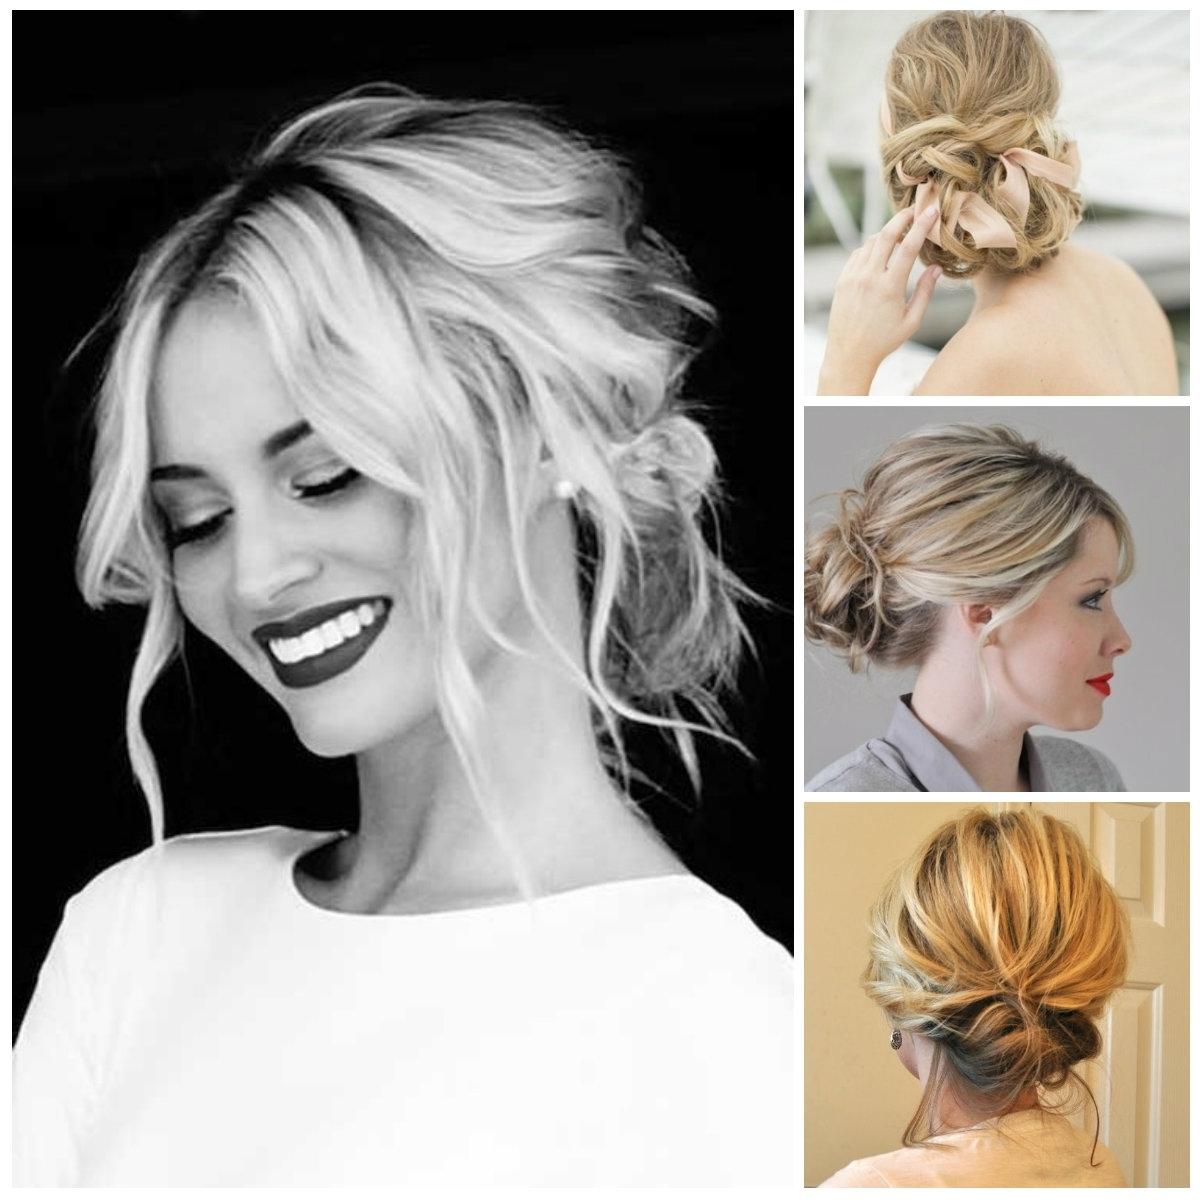 Favorite Medium Length Updo Wedding Hairstyles Intended For Updo Hairstyles For Medium Length – Hairstyle For Women & Man (View 3 of 15)